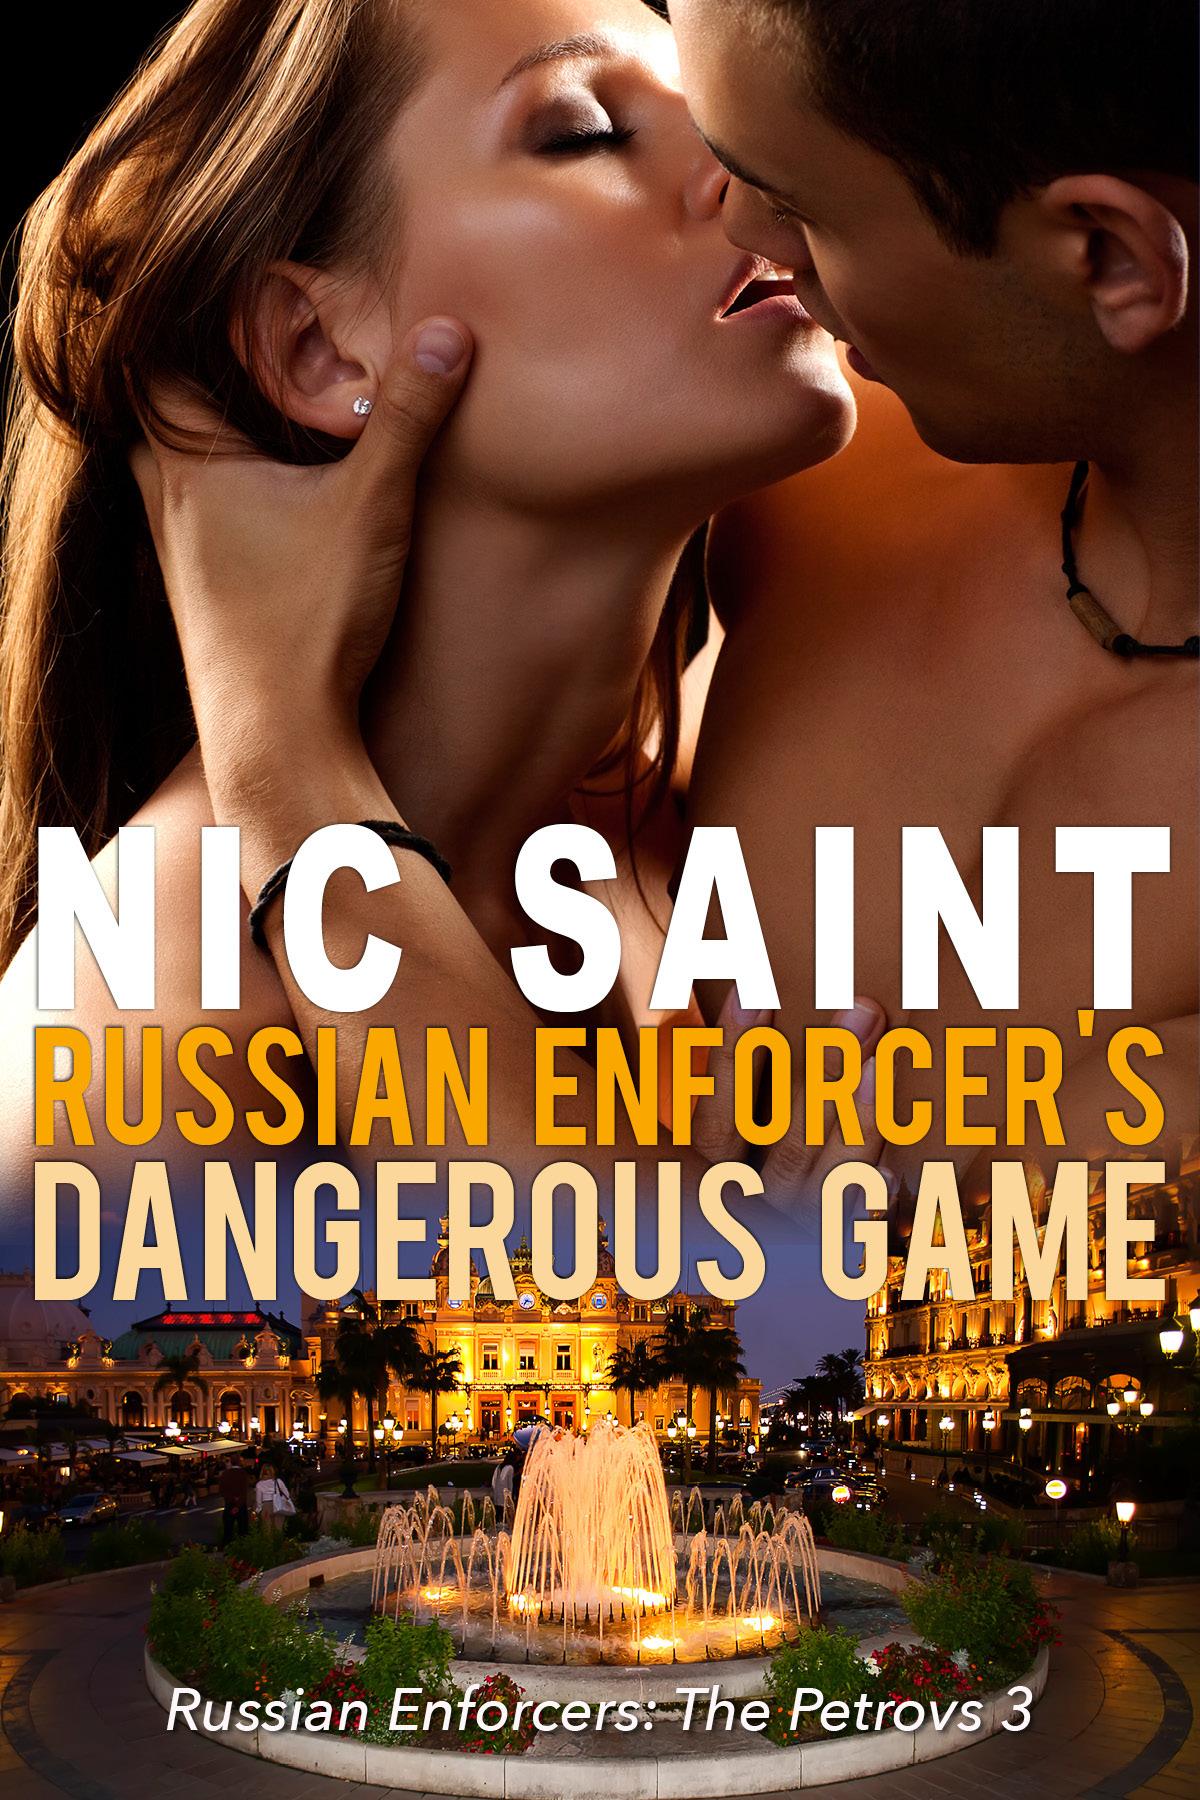 Russian Enforcers Dangerous Game (Russian Enforcers: The Petrovs #3)  by  Nic Saint